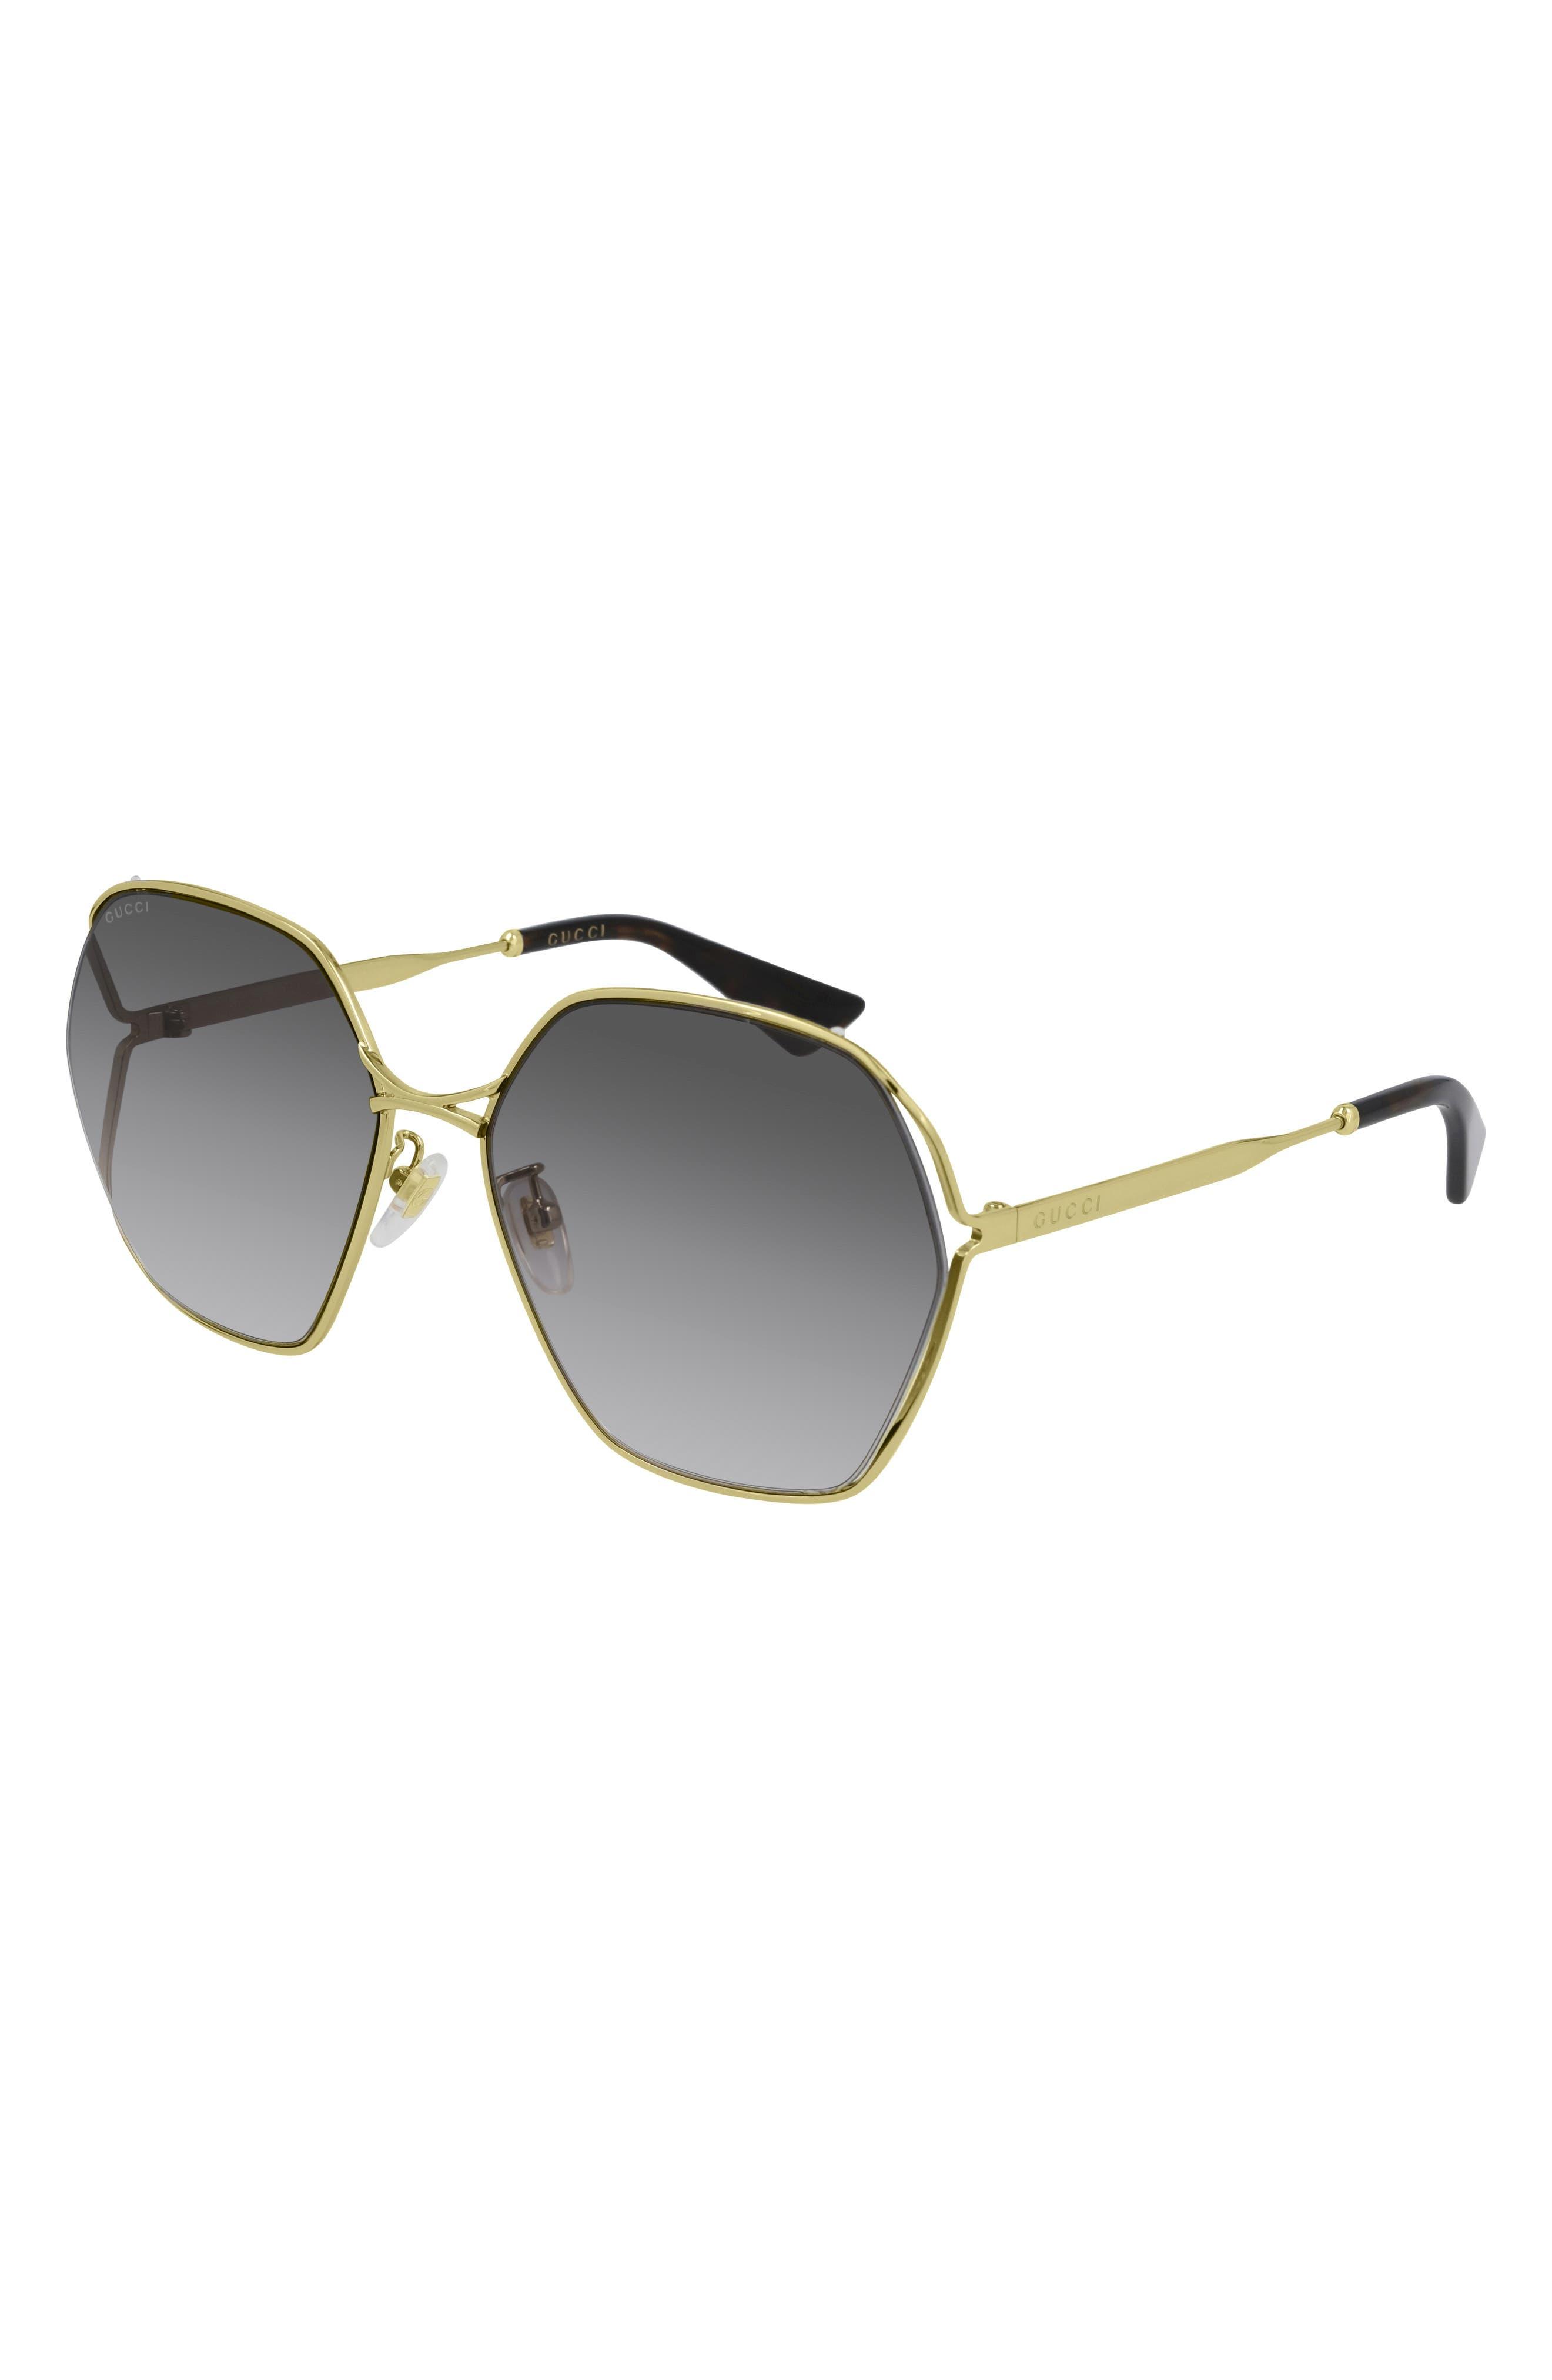 Gucci GG0138S 002 Gold Aviator Sunglasses   Gold aviator